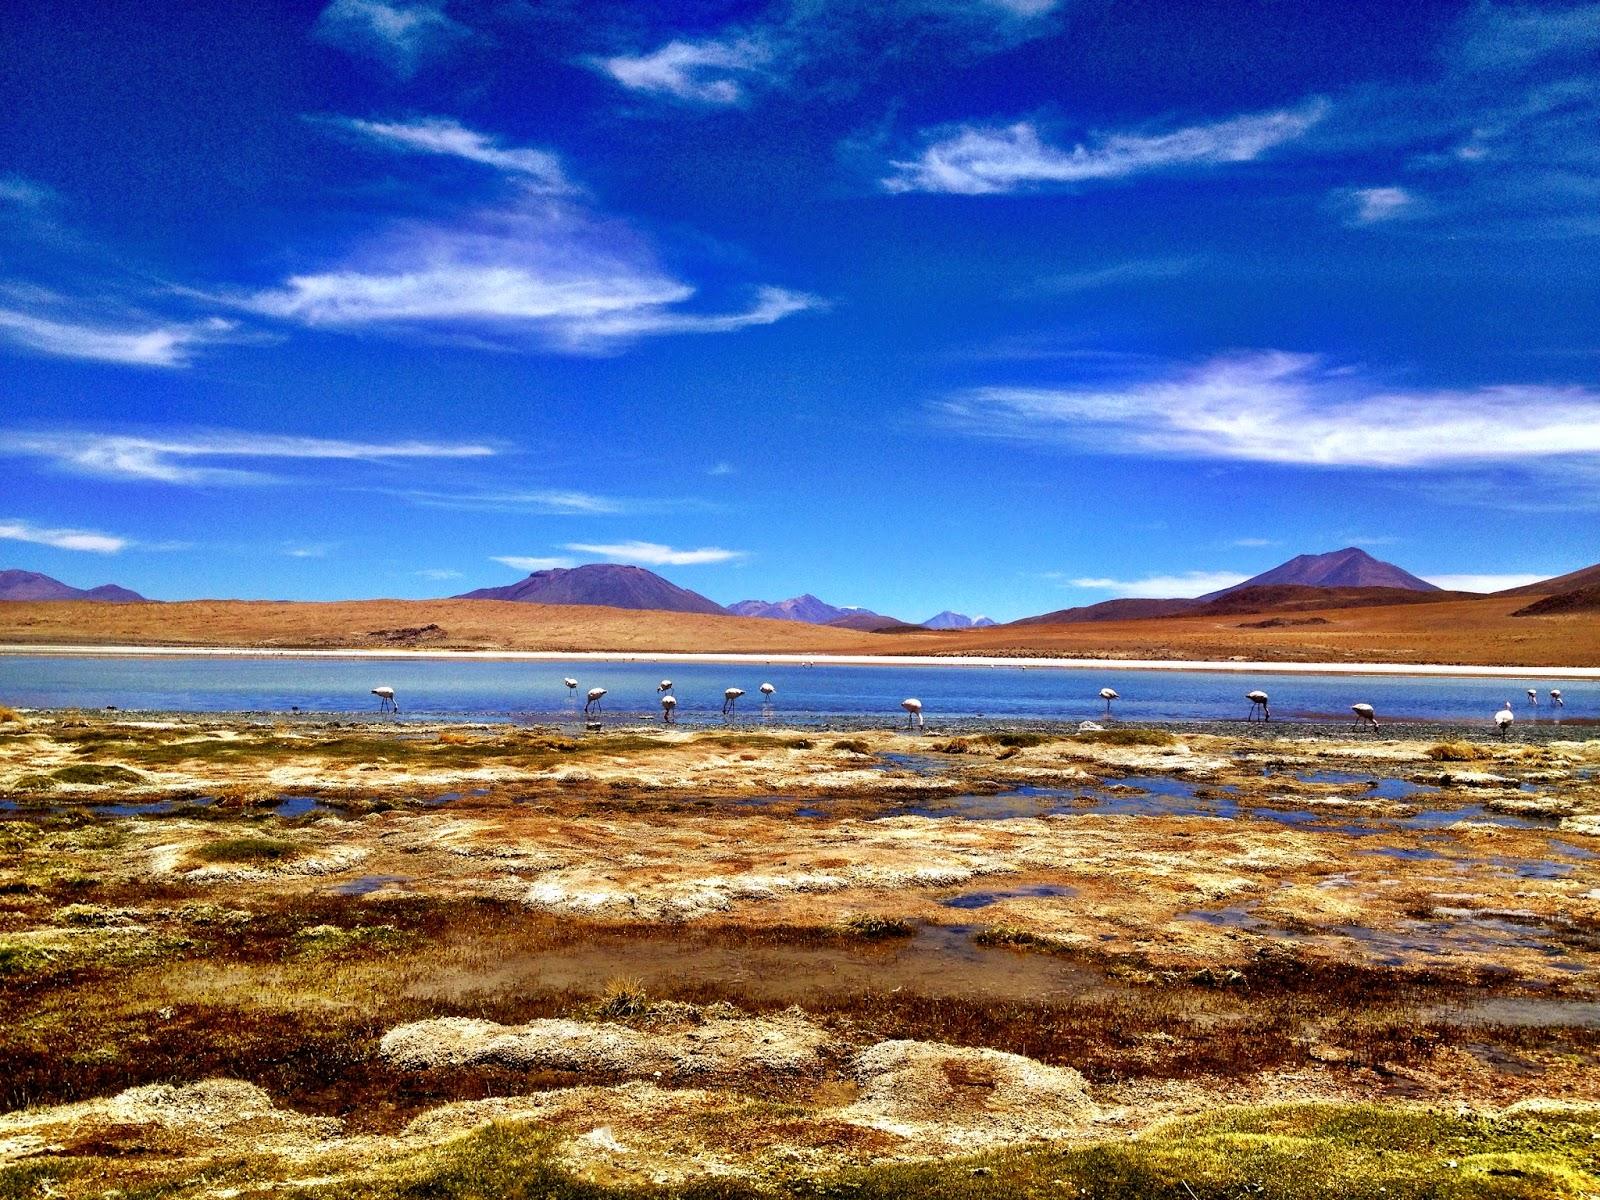 Laguna Hedionda - Salar de Uyuni